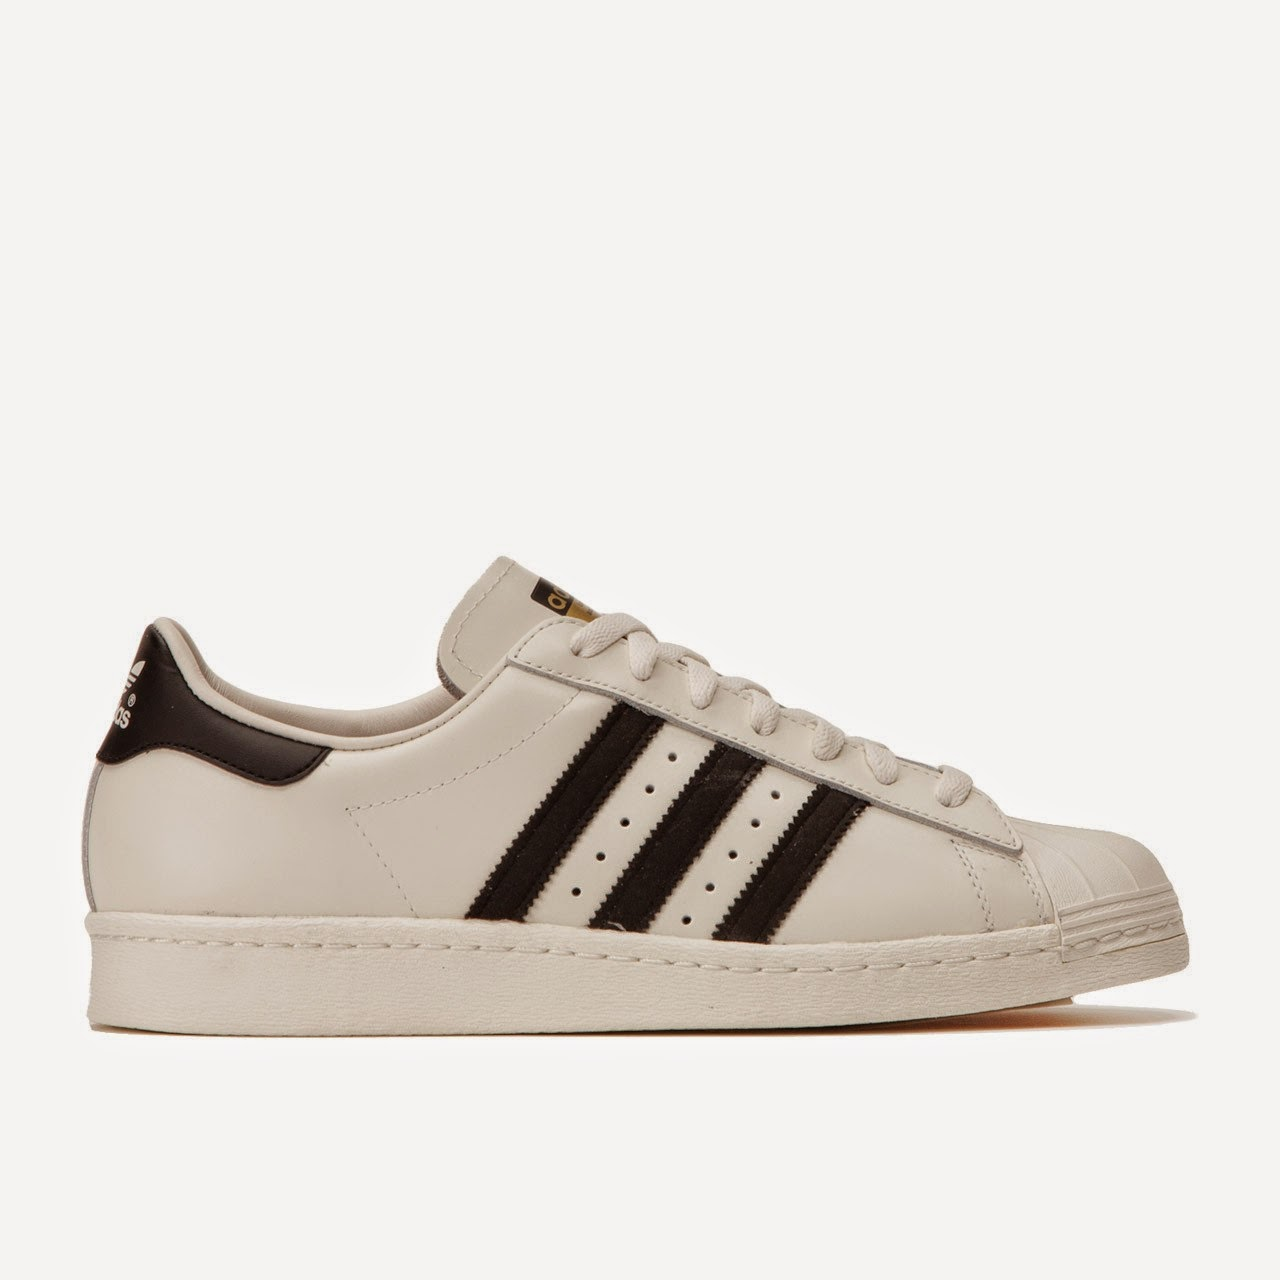 80's Adidas Superstar Dlx Fitzrovia EntiendafitzroviaTienda P8nwX0kNO